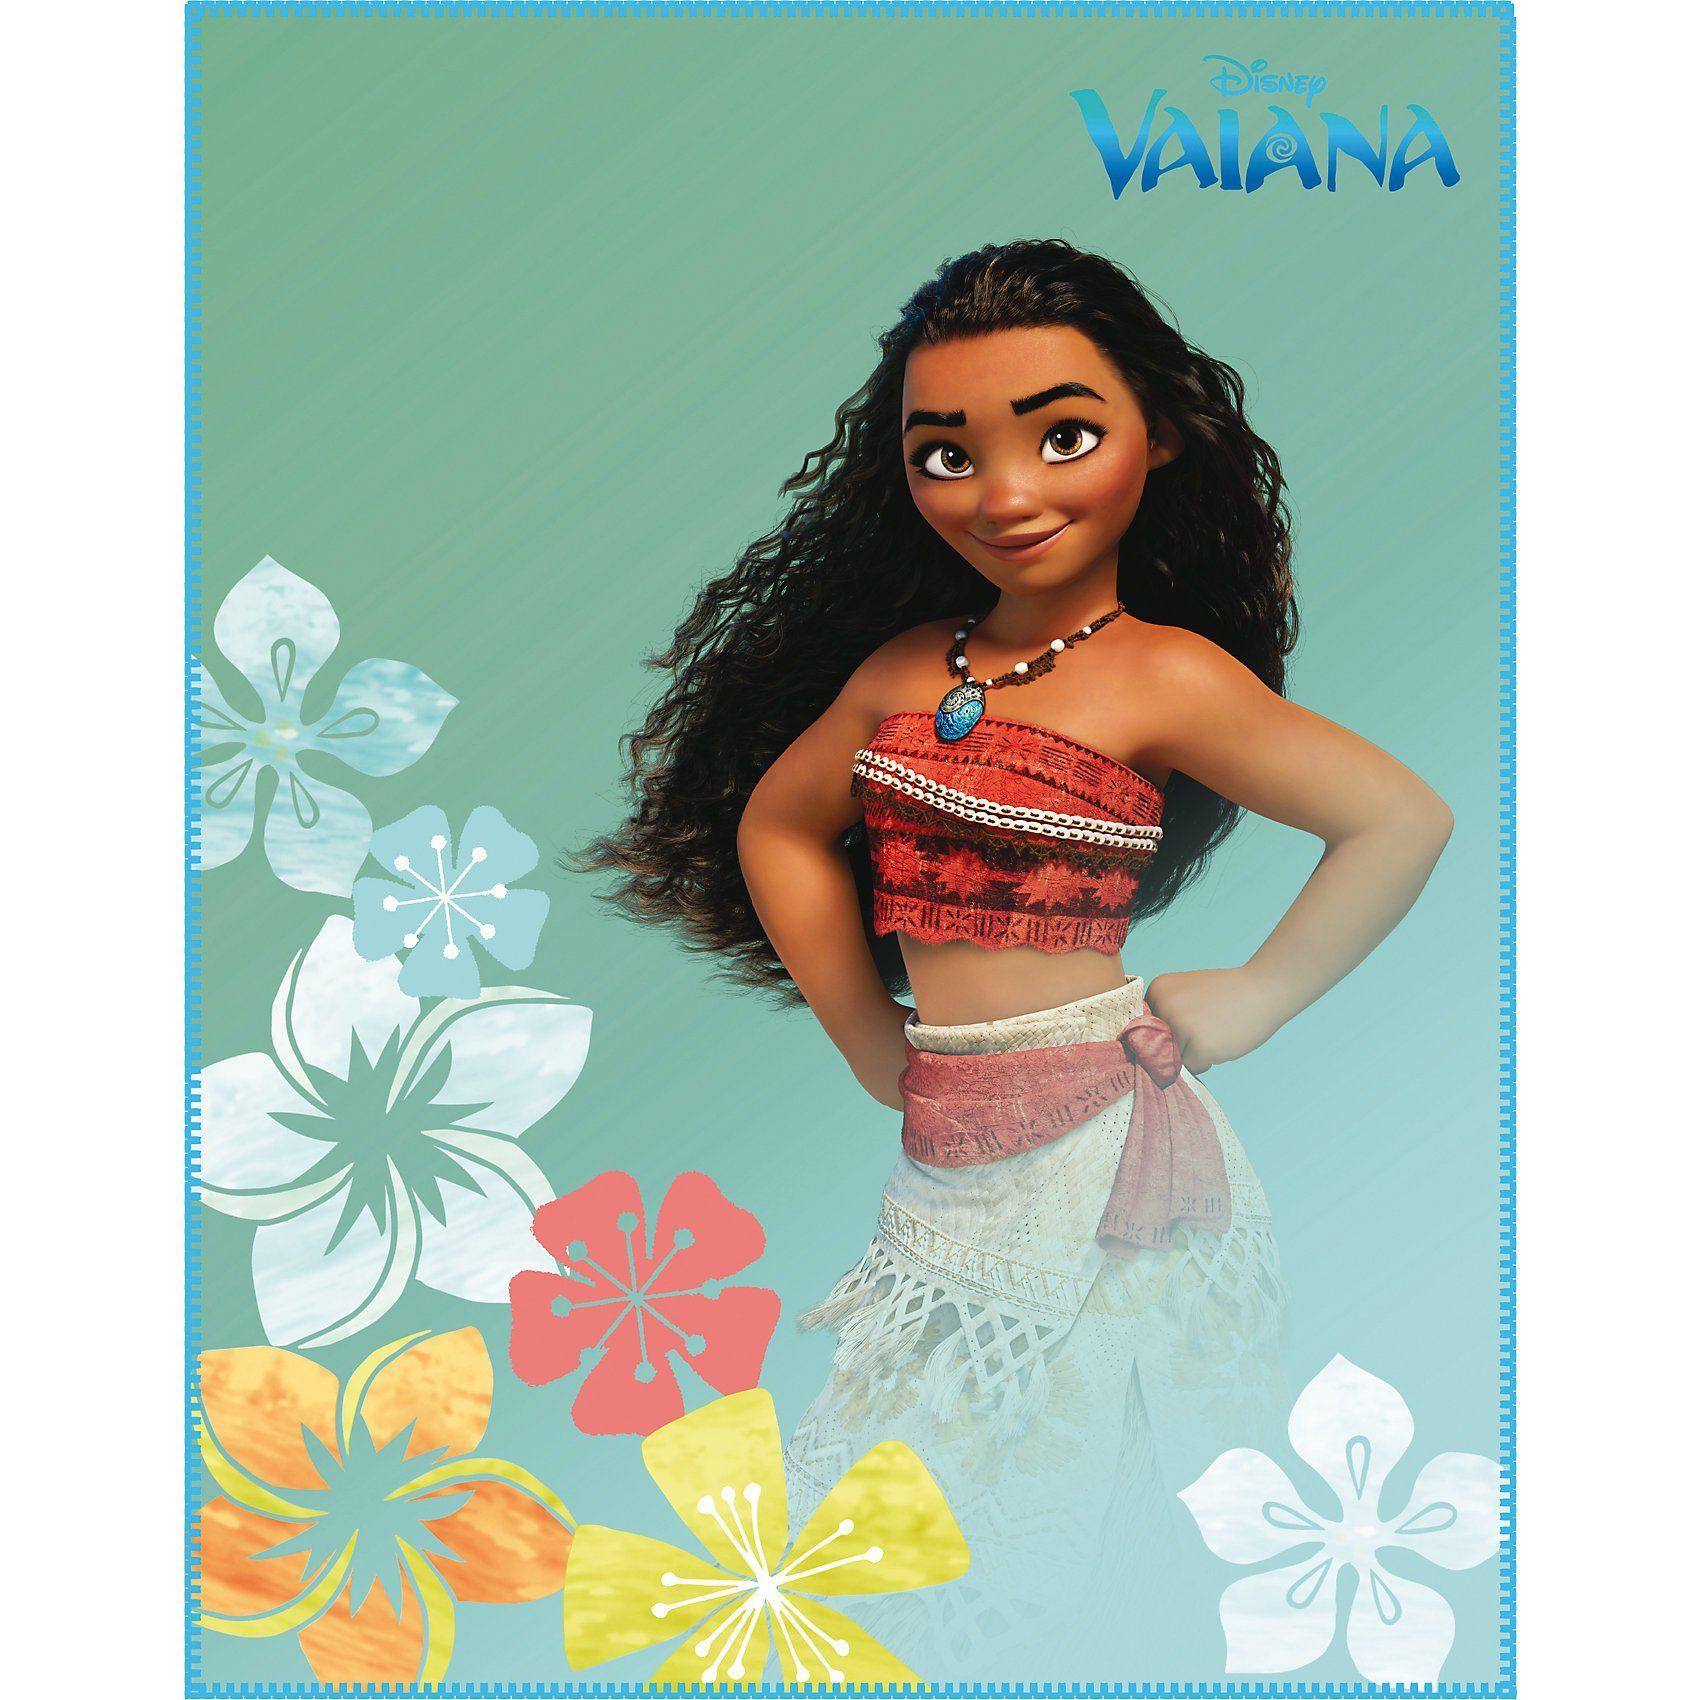 CTI Kuscheldecke Vaiana Aloha, 110 x 140 cm